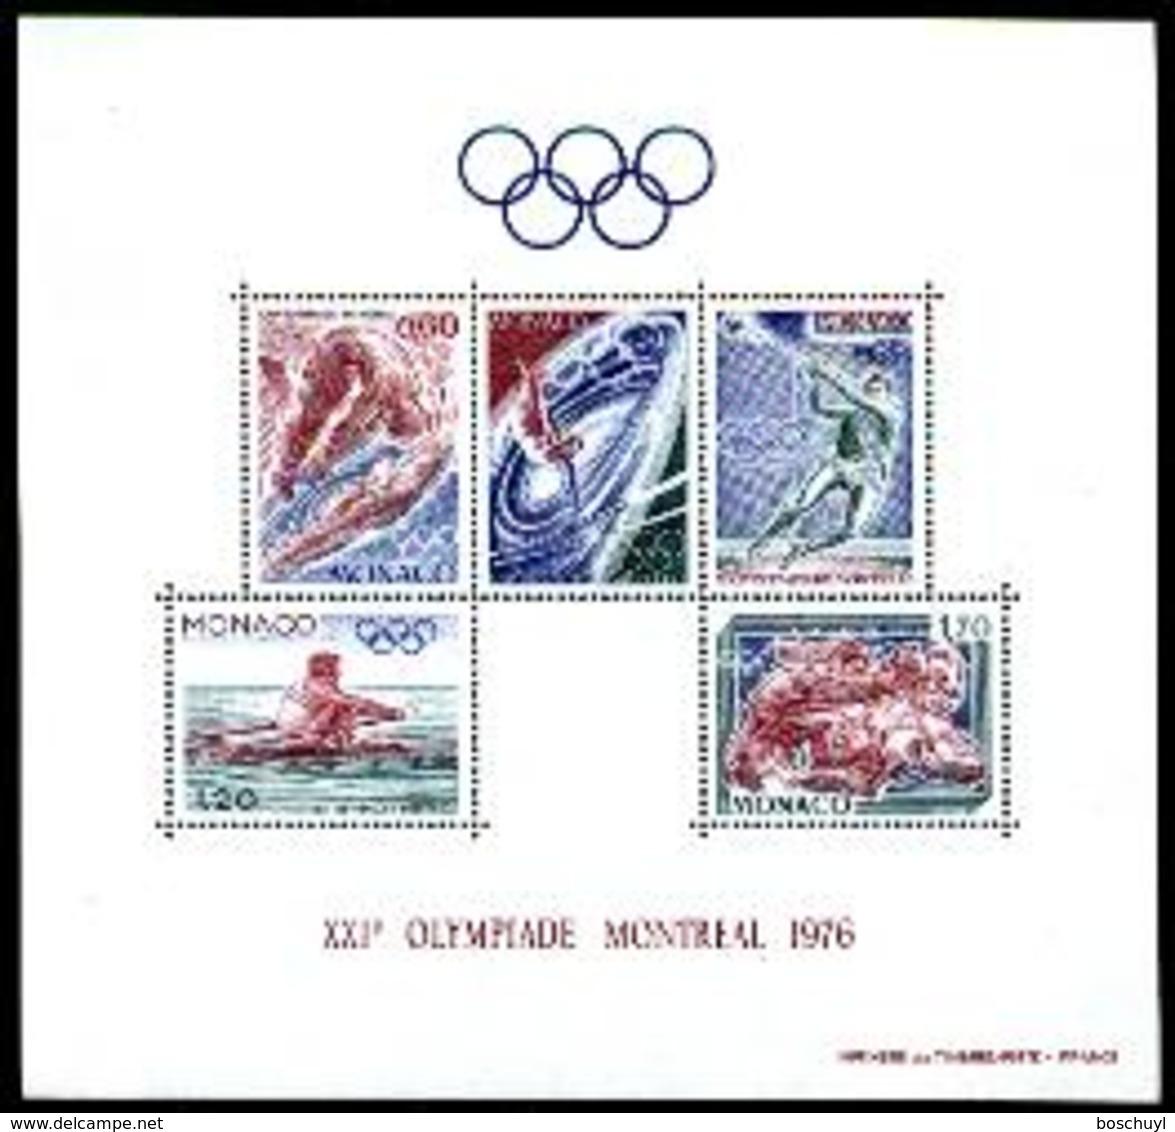 Monaco, 1976, Olympic Summer Games Montreal, Sports, MNH, Michel Block 9 - Monaco